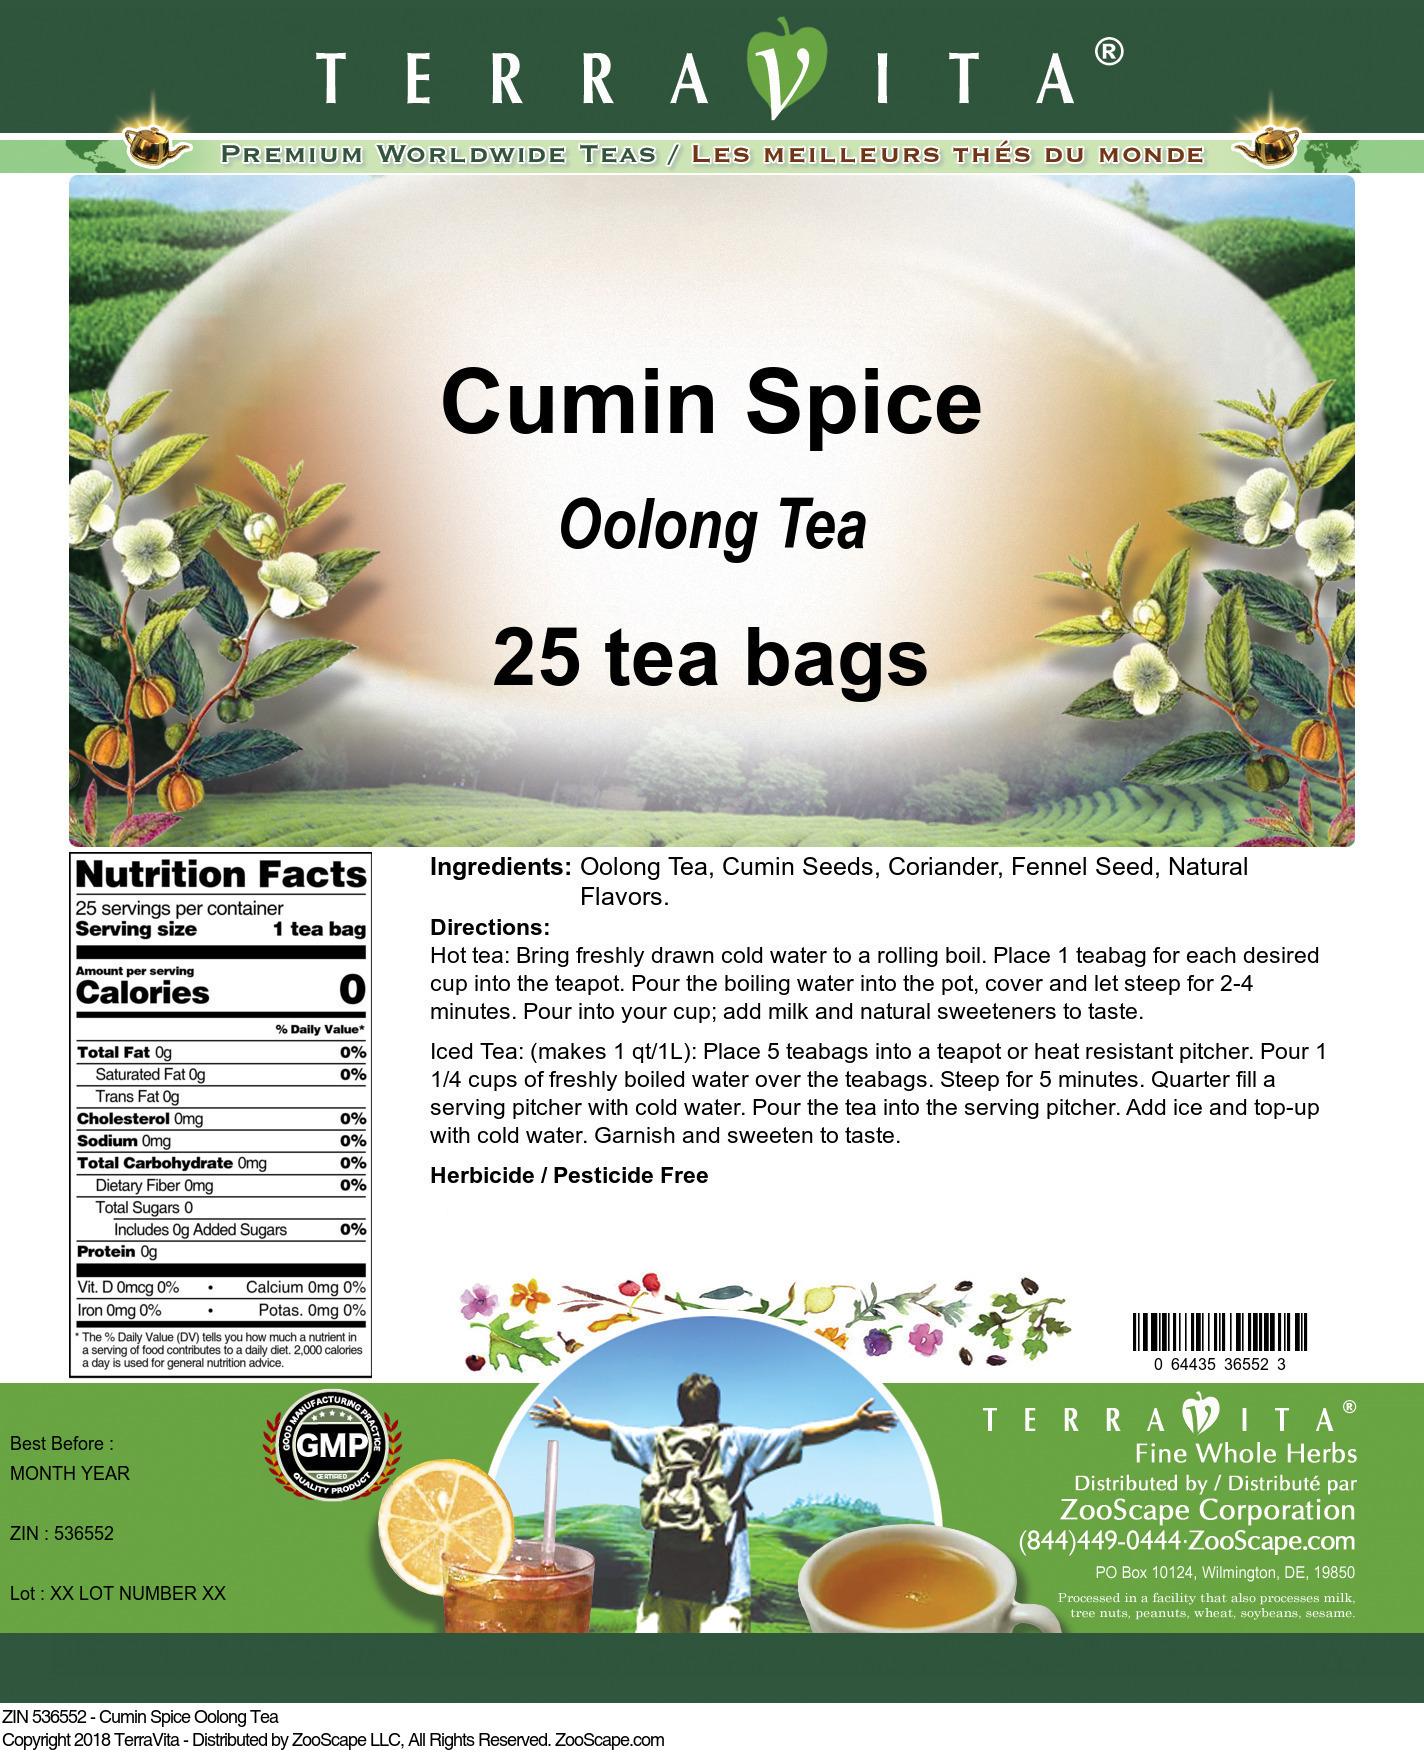 Cumin Spice Oolong Tea